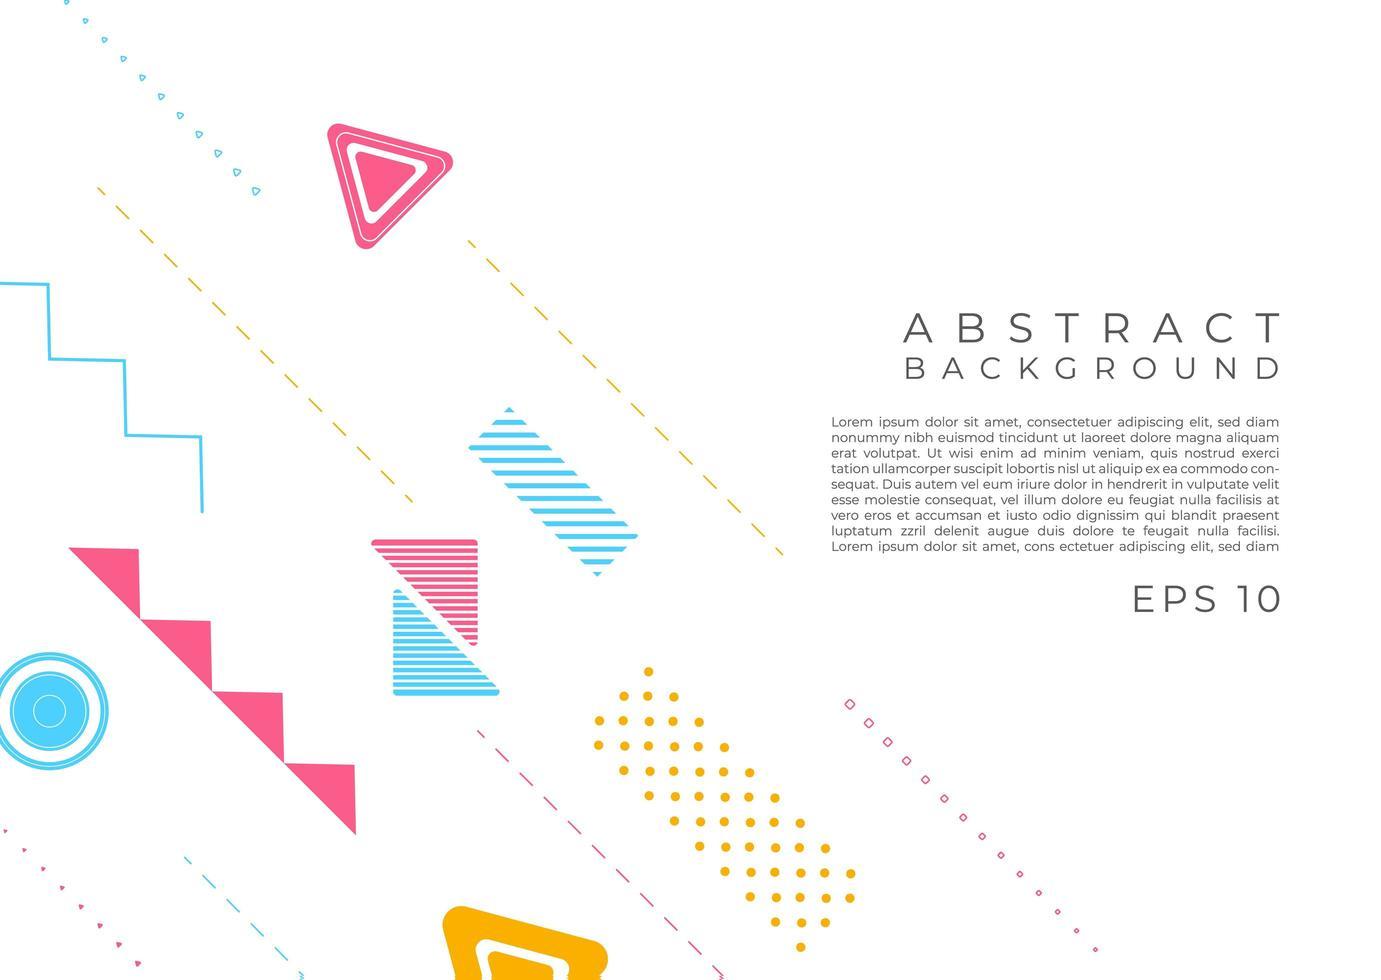 Abstract background modern geometric shape desgin vector